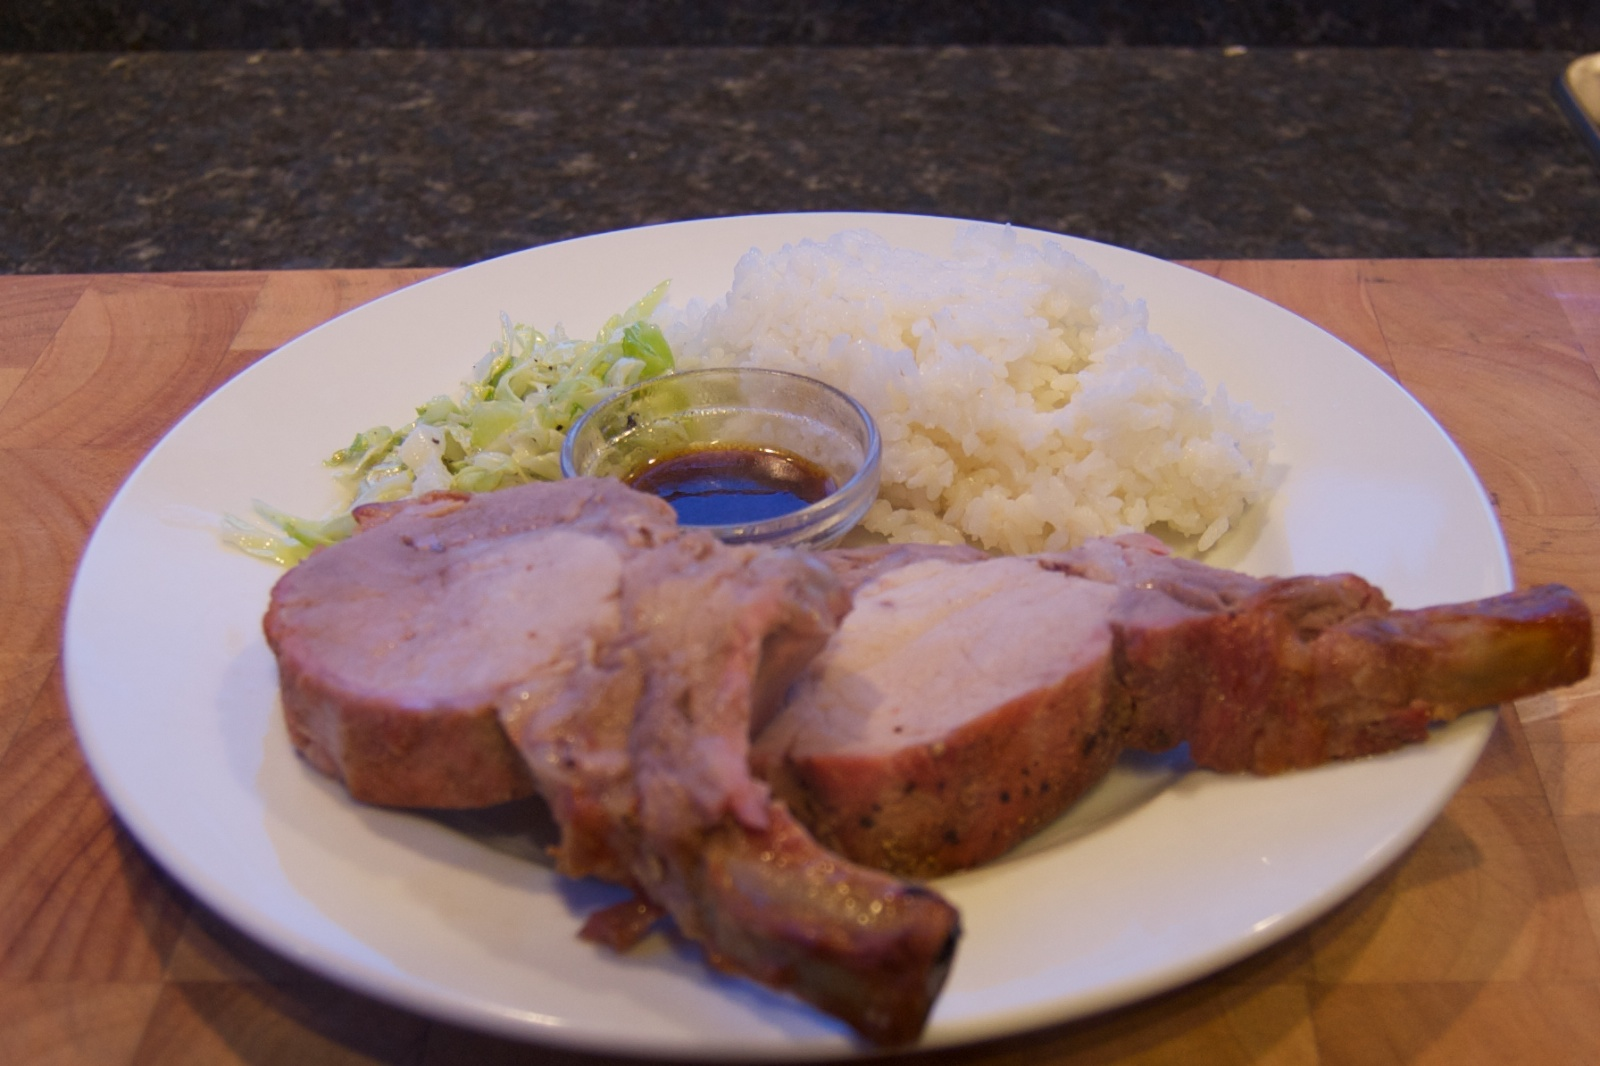 http://blog.rickk.com/food/2011/12/29/ate.2011.12.29.d.jpg